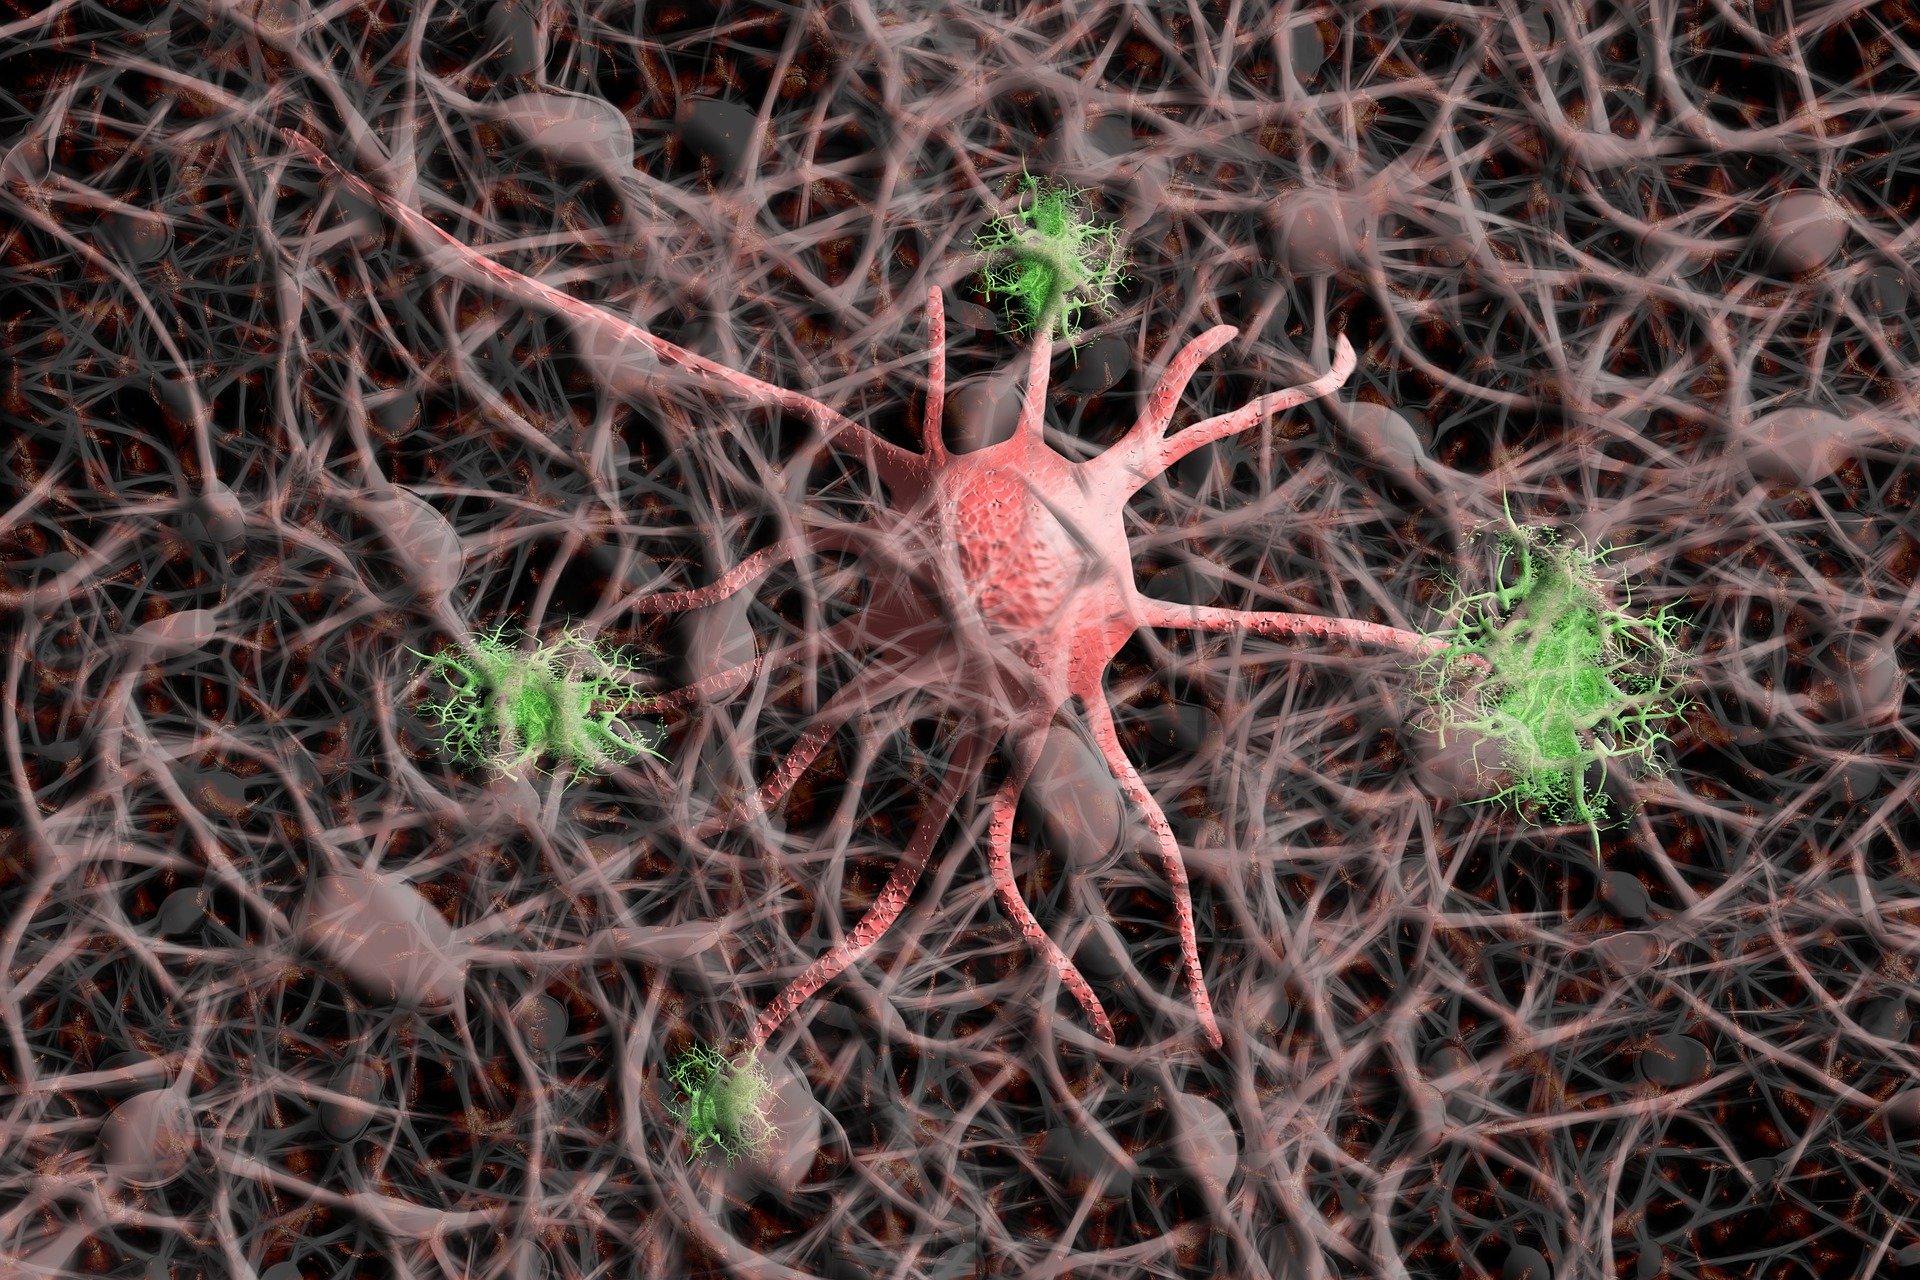 Neuroregeneration: New Therapeutics for Alzheimer's Dementia